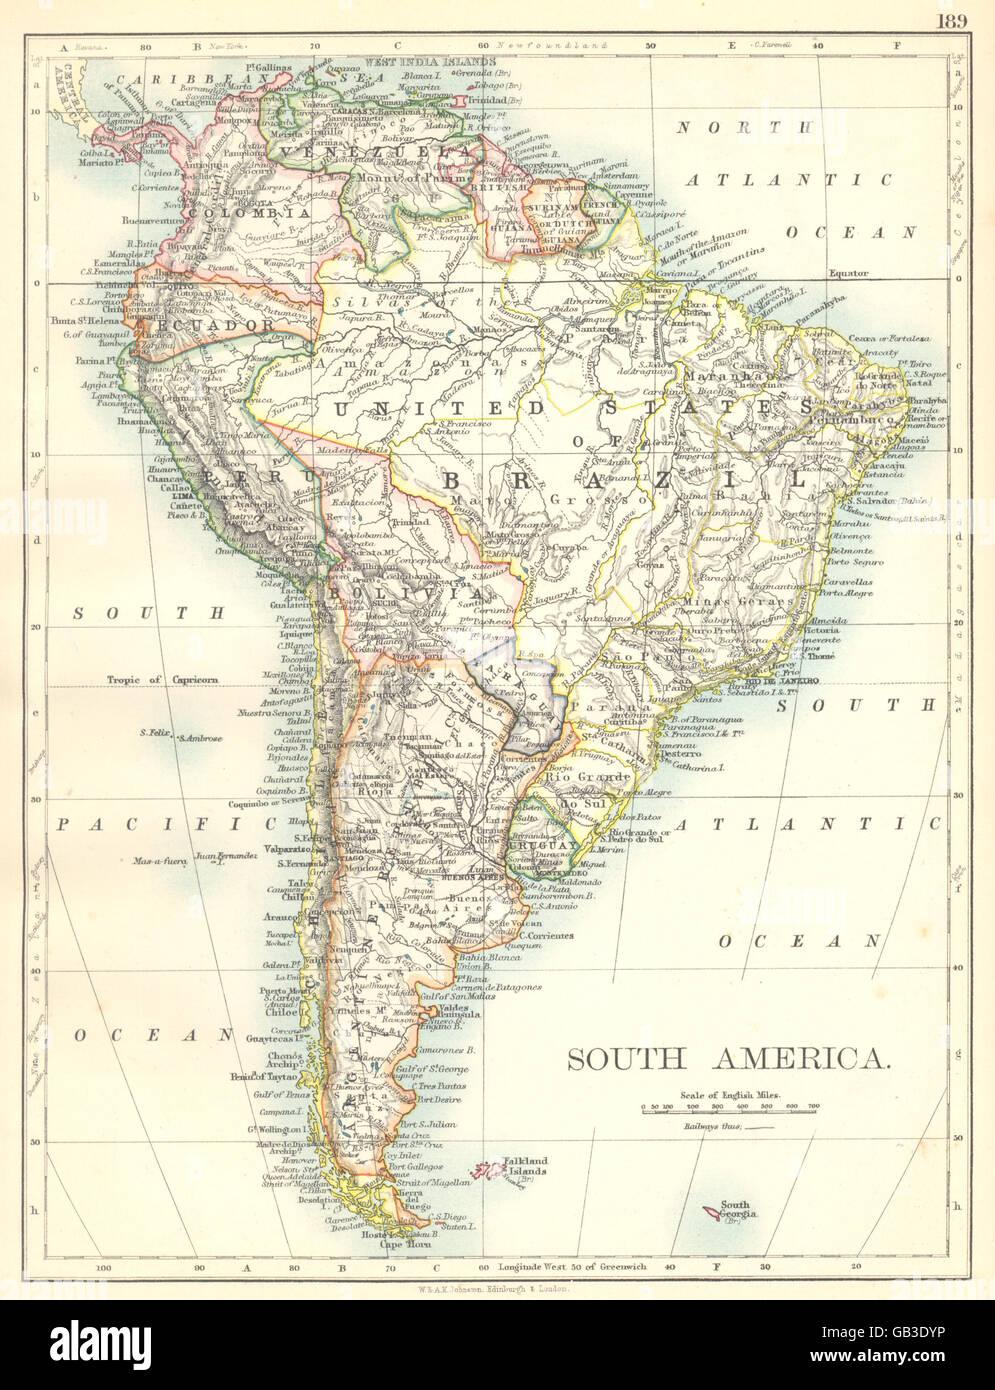 SOUTH AMERICA Brazil Argentina Peru Bolivia Paraguay Uruguay Chile